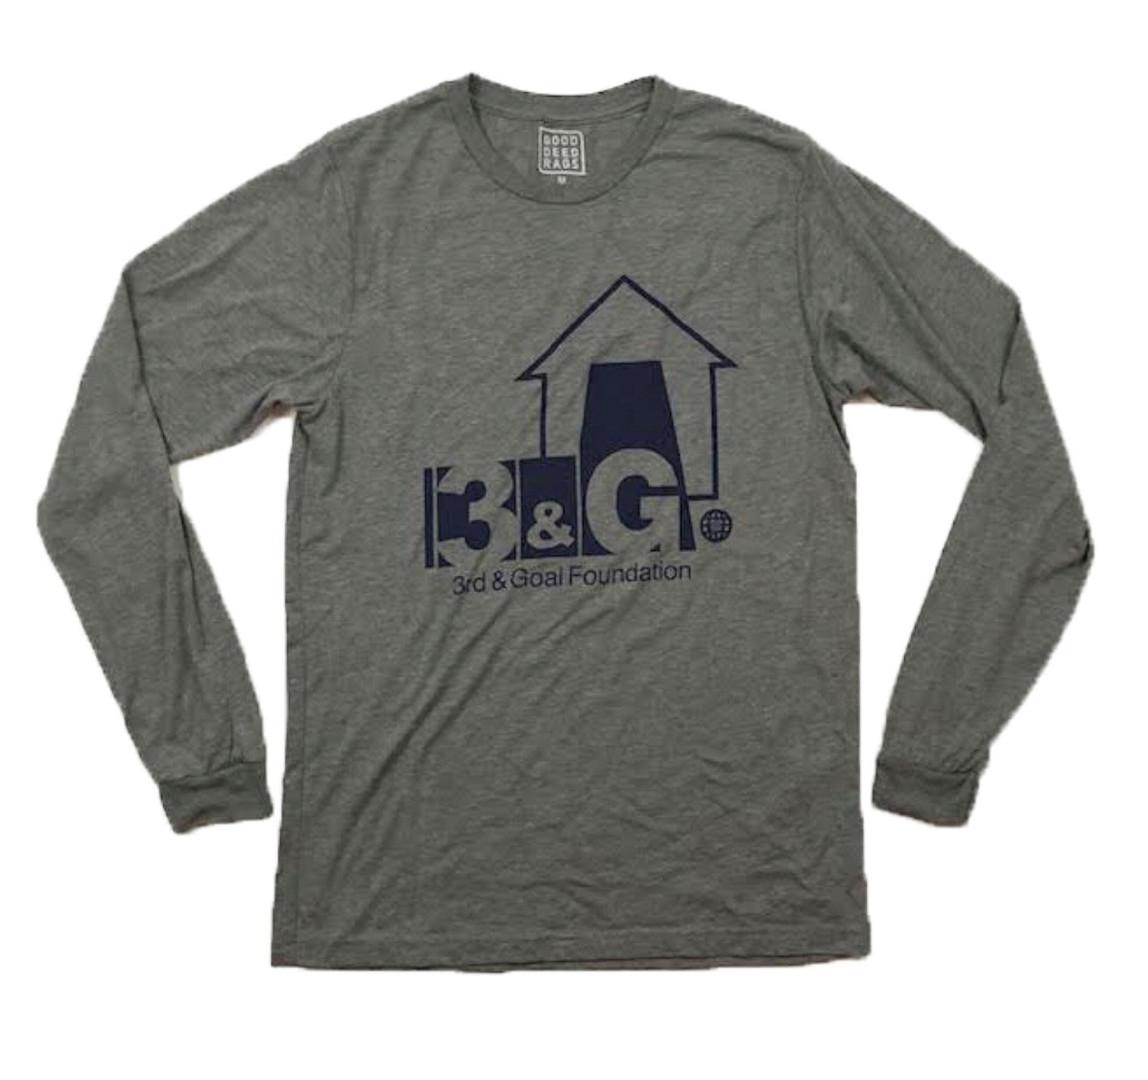 3rd & Goal Foundation Long Sleeve Shirt